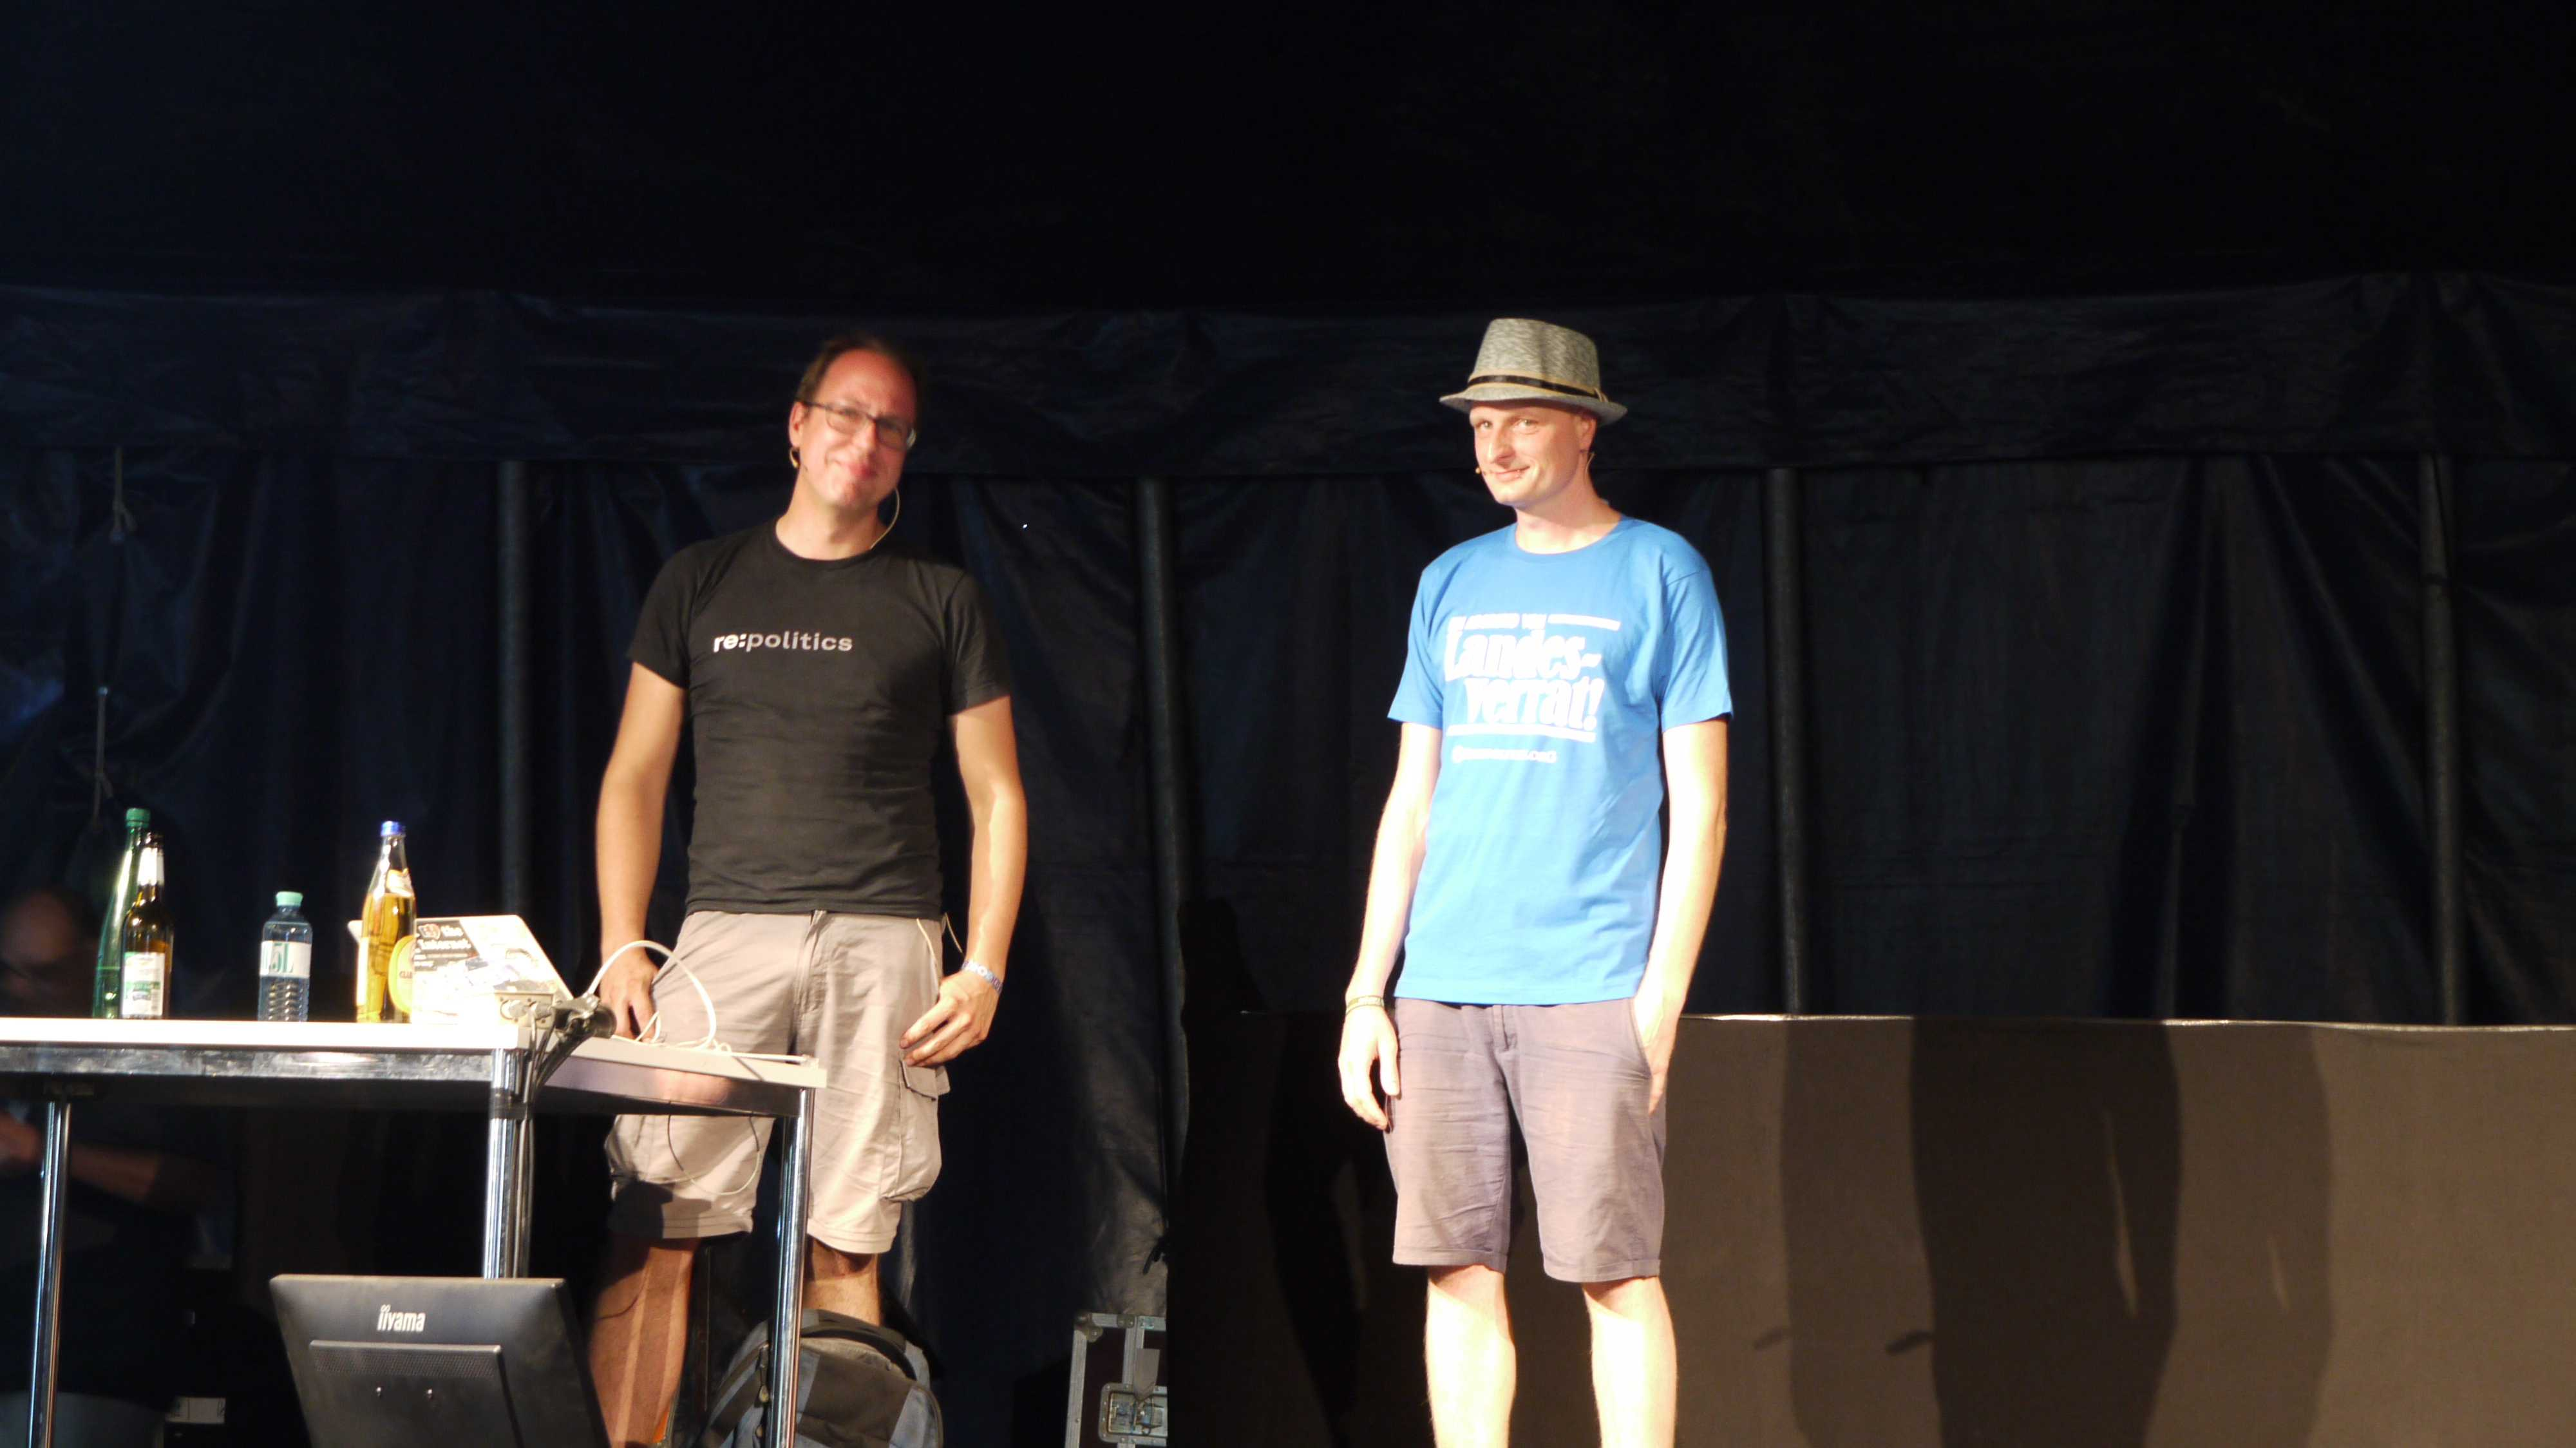 Markus Beckedahl (links) und André Meister (rechts) auf dem Chaos Communication Camp 2015